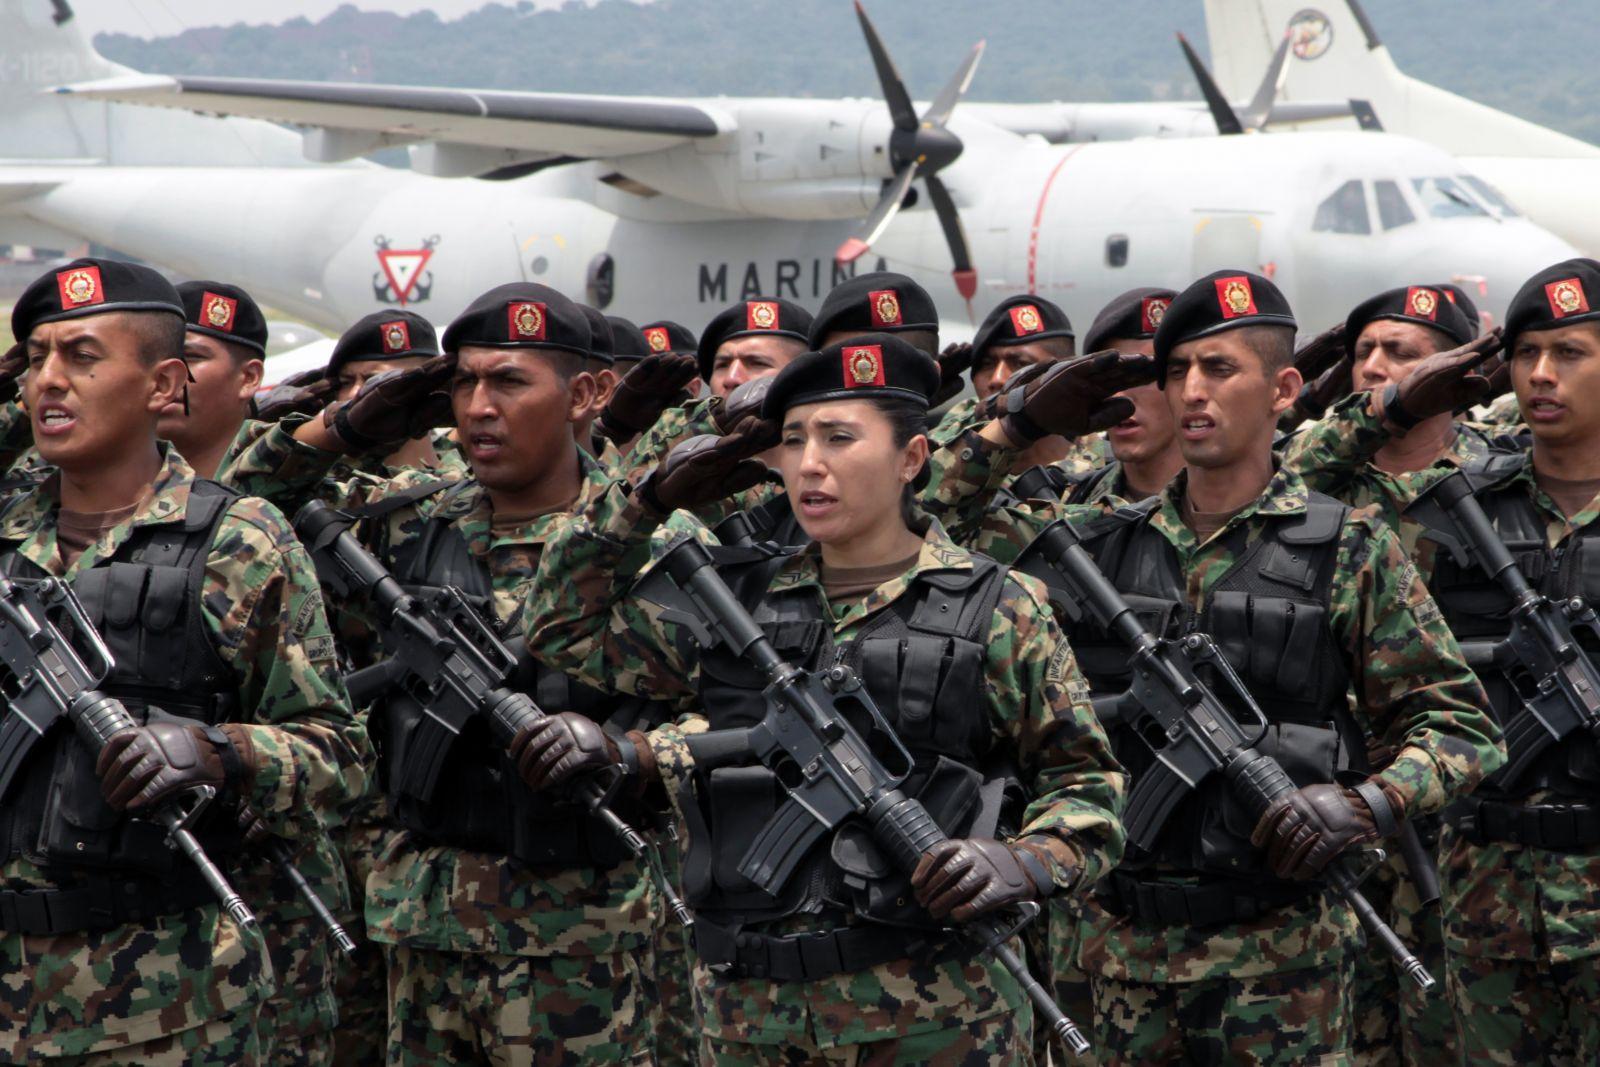 Troupes mexicaines déployées en Haïti (Minustah) Photo : M. García